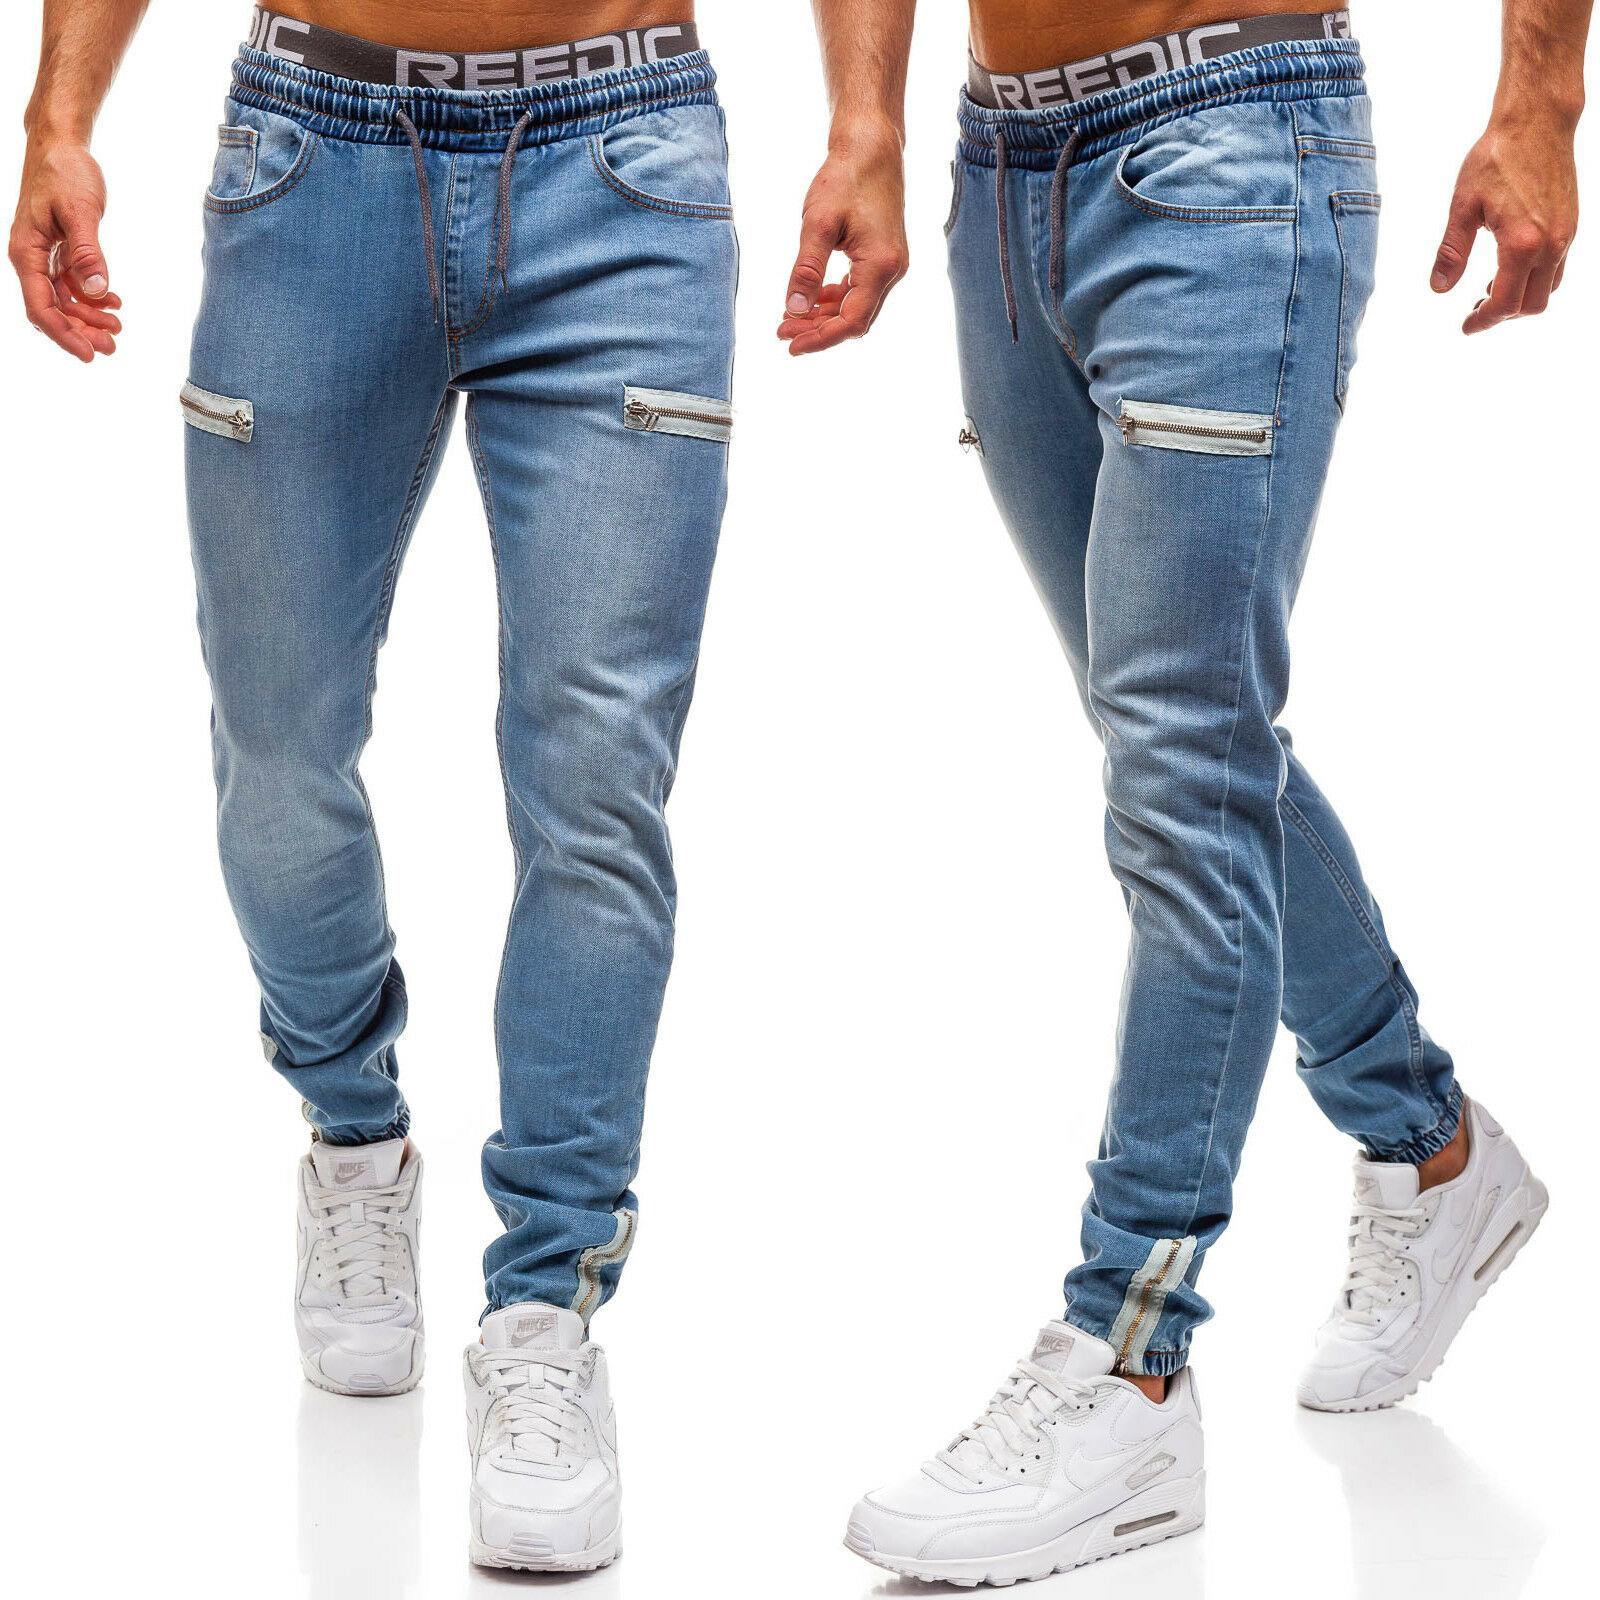 Hot Selling 2019 Autumn Clothing Men Cowboy Casual Zipper Design Sports Jeans Men's T354